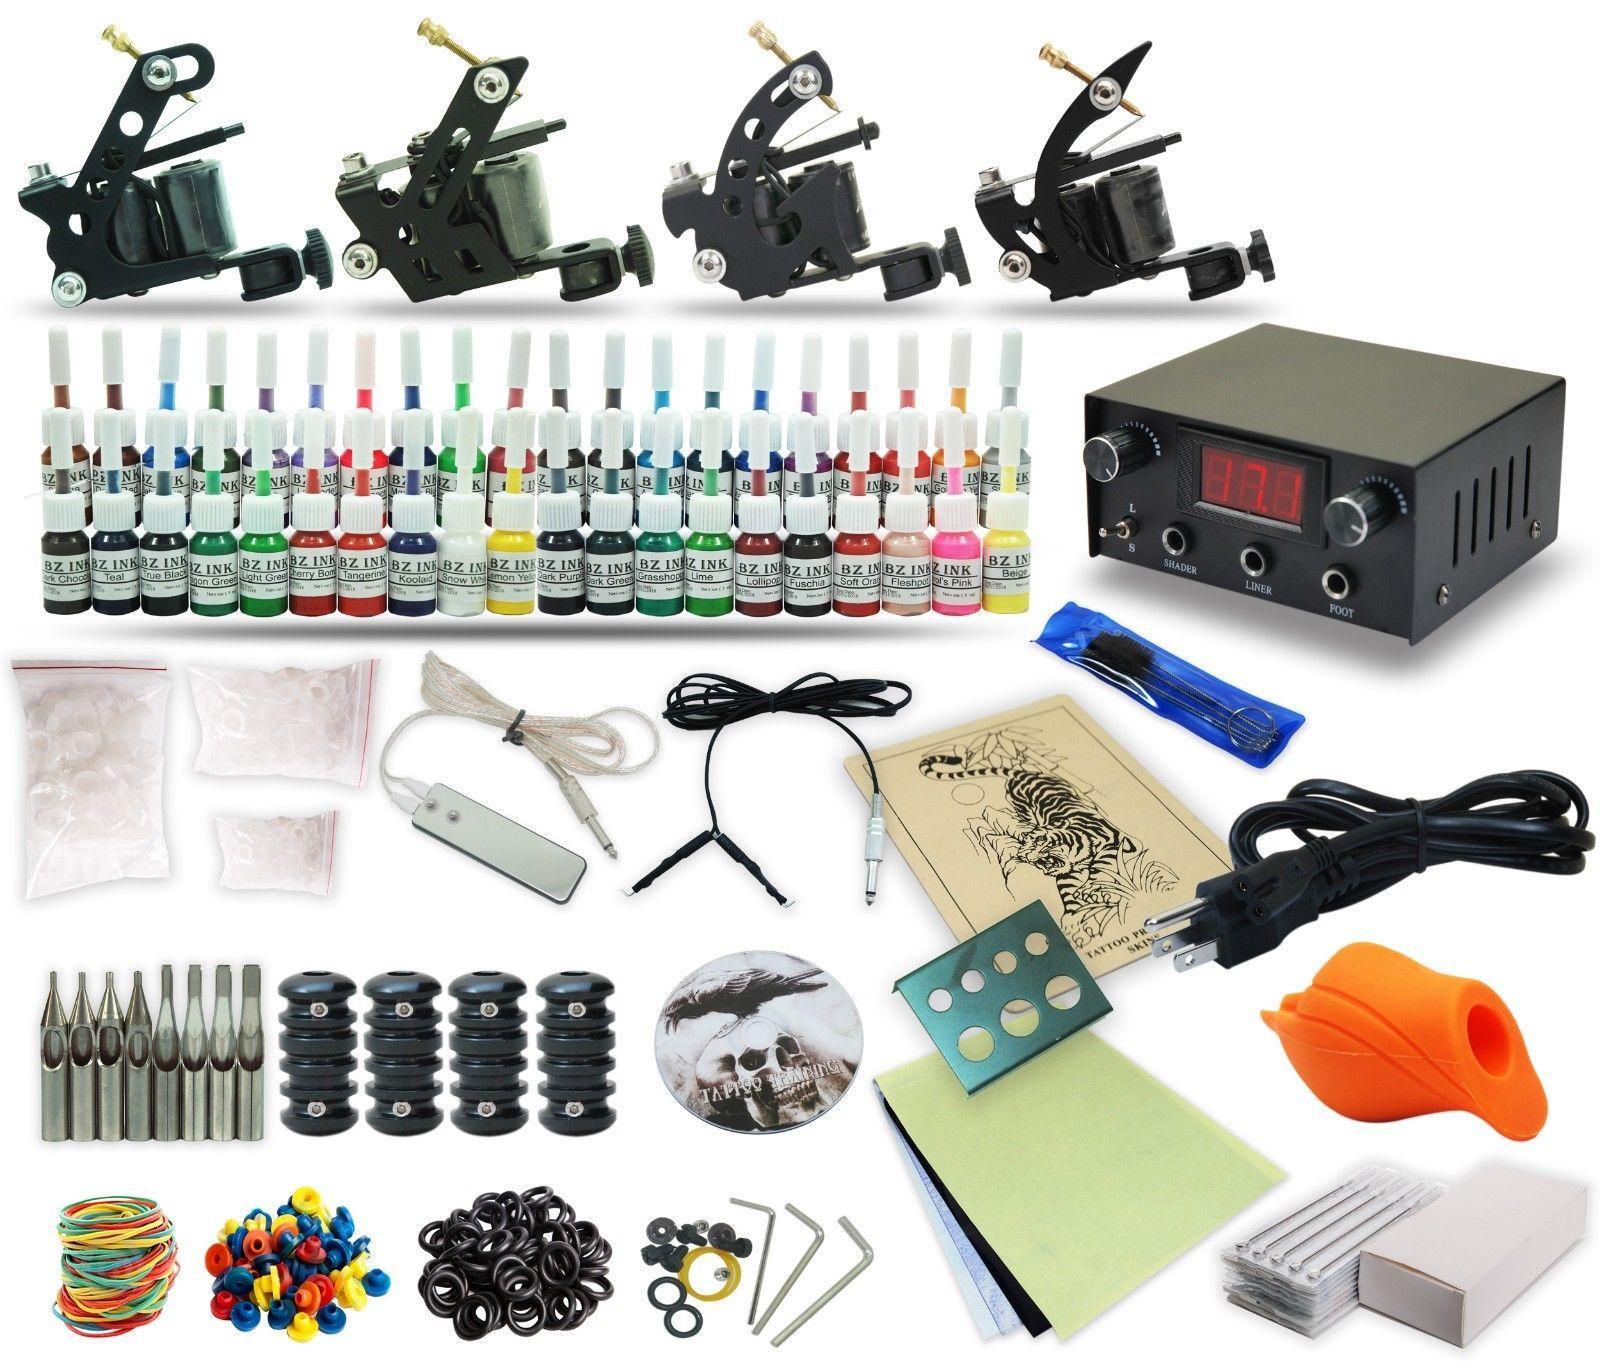 Pro tattoo kit 4 machine gun power supply foot pedal ink for Best tattoo power supply